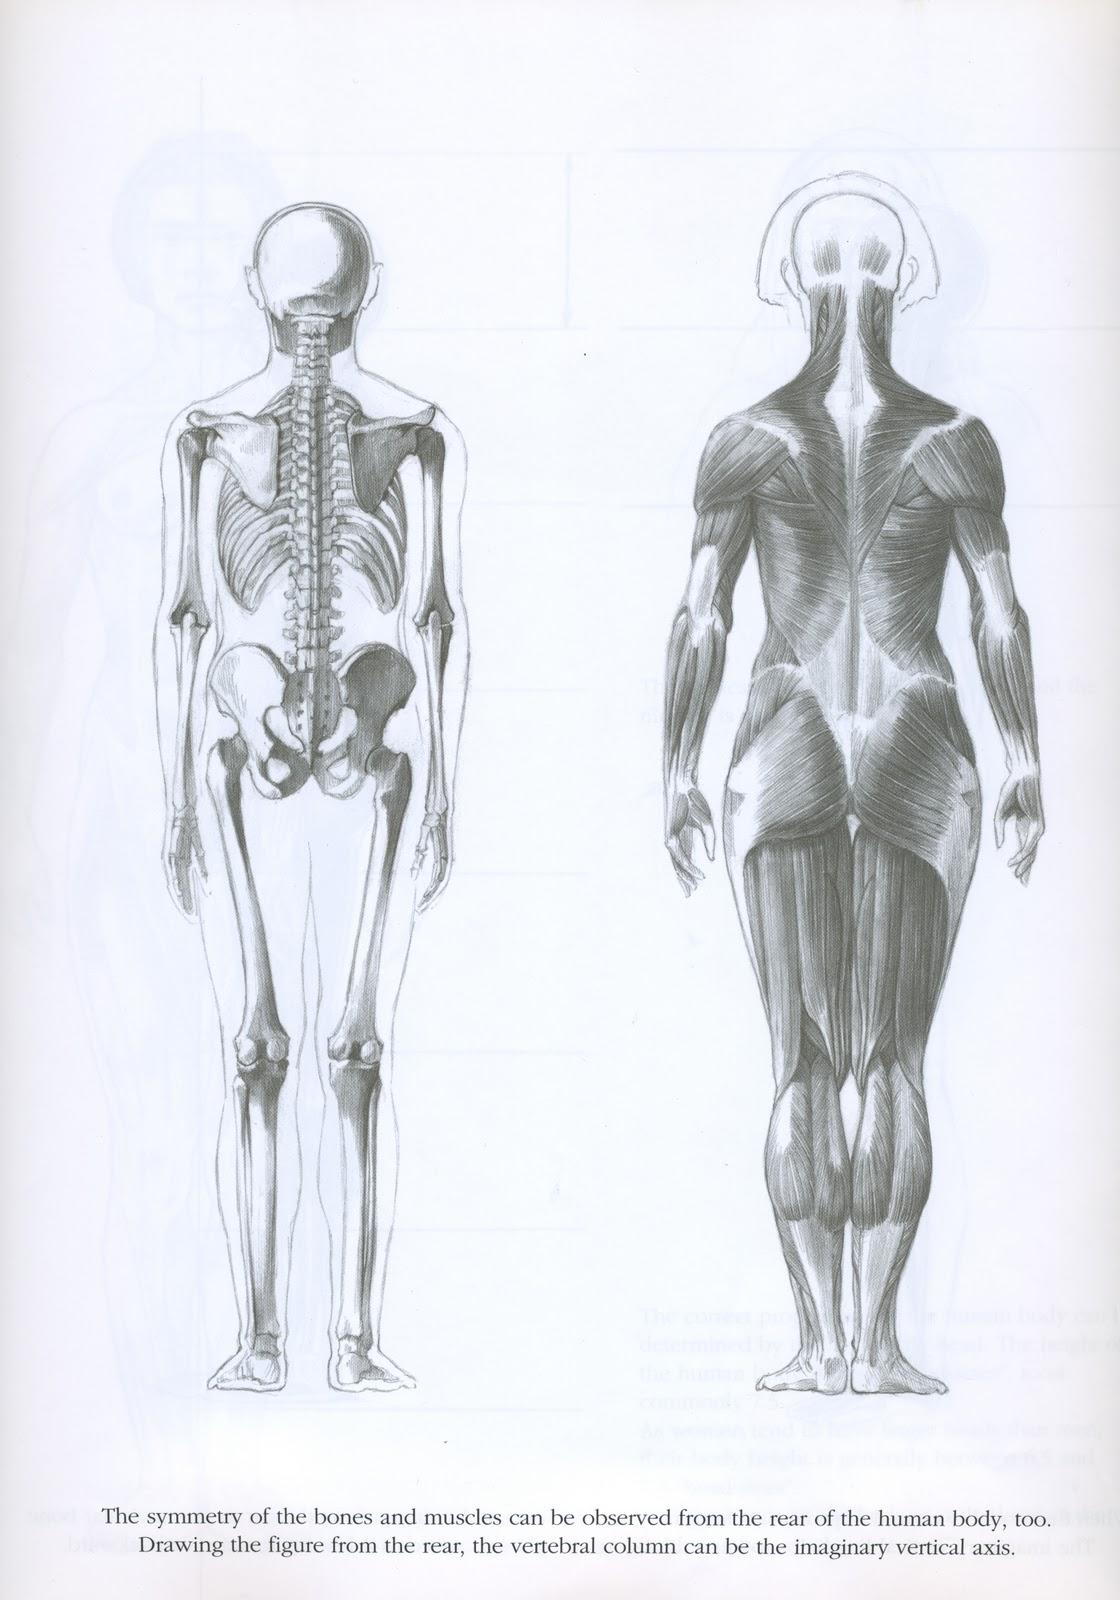 http://1.bp.blogspot.com/_ekfkiJWxZxE/TKfOFcbexgI/AAAAAAAAAYI/4izvLD1Omuo/s1600/anatomy%2Bscan%2B25.jpg